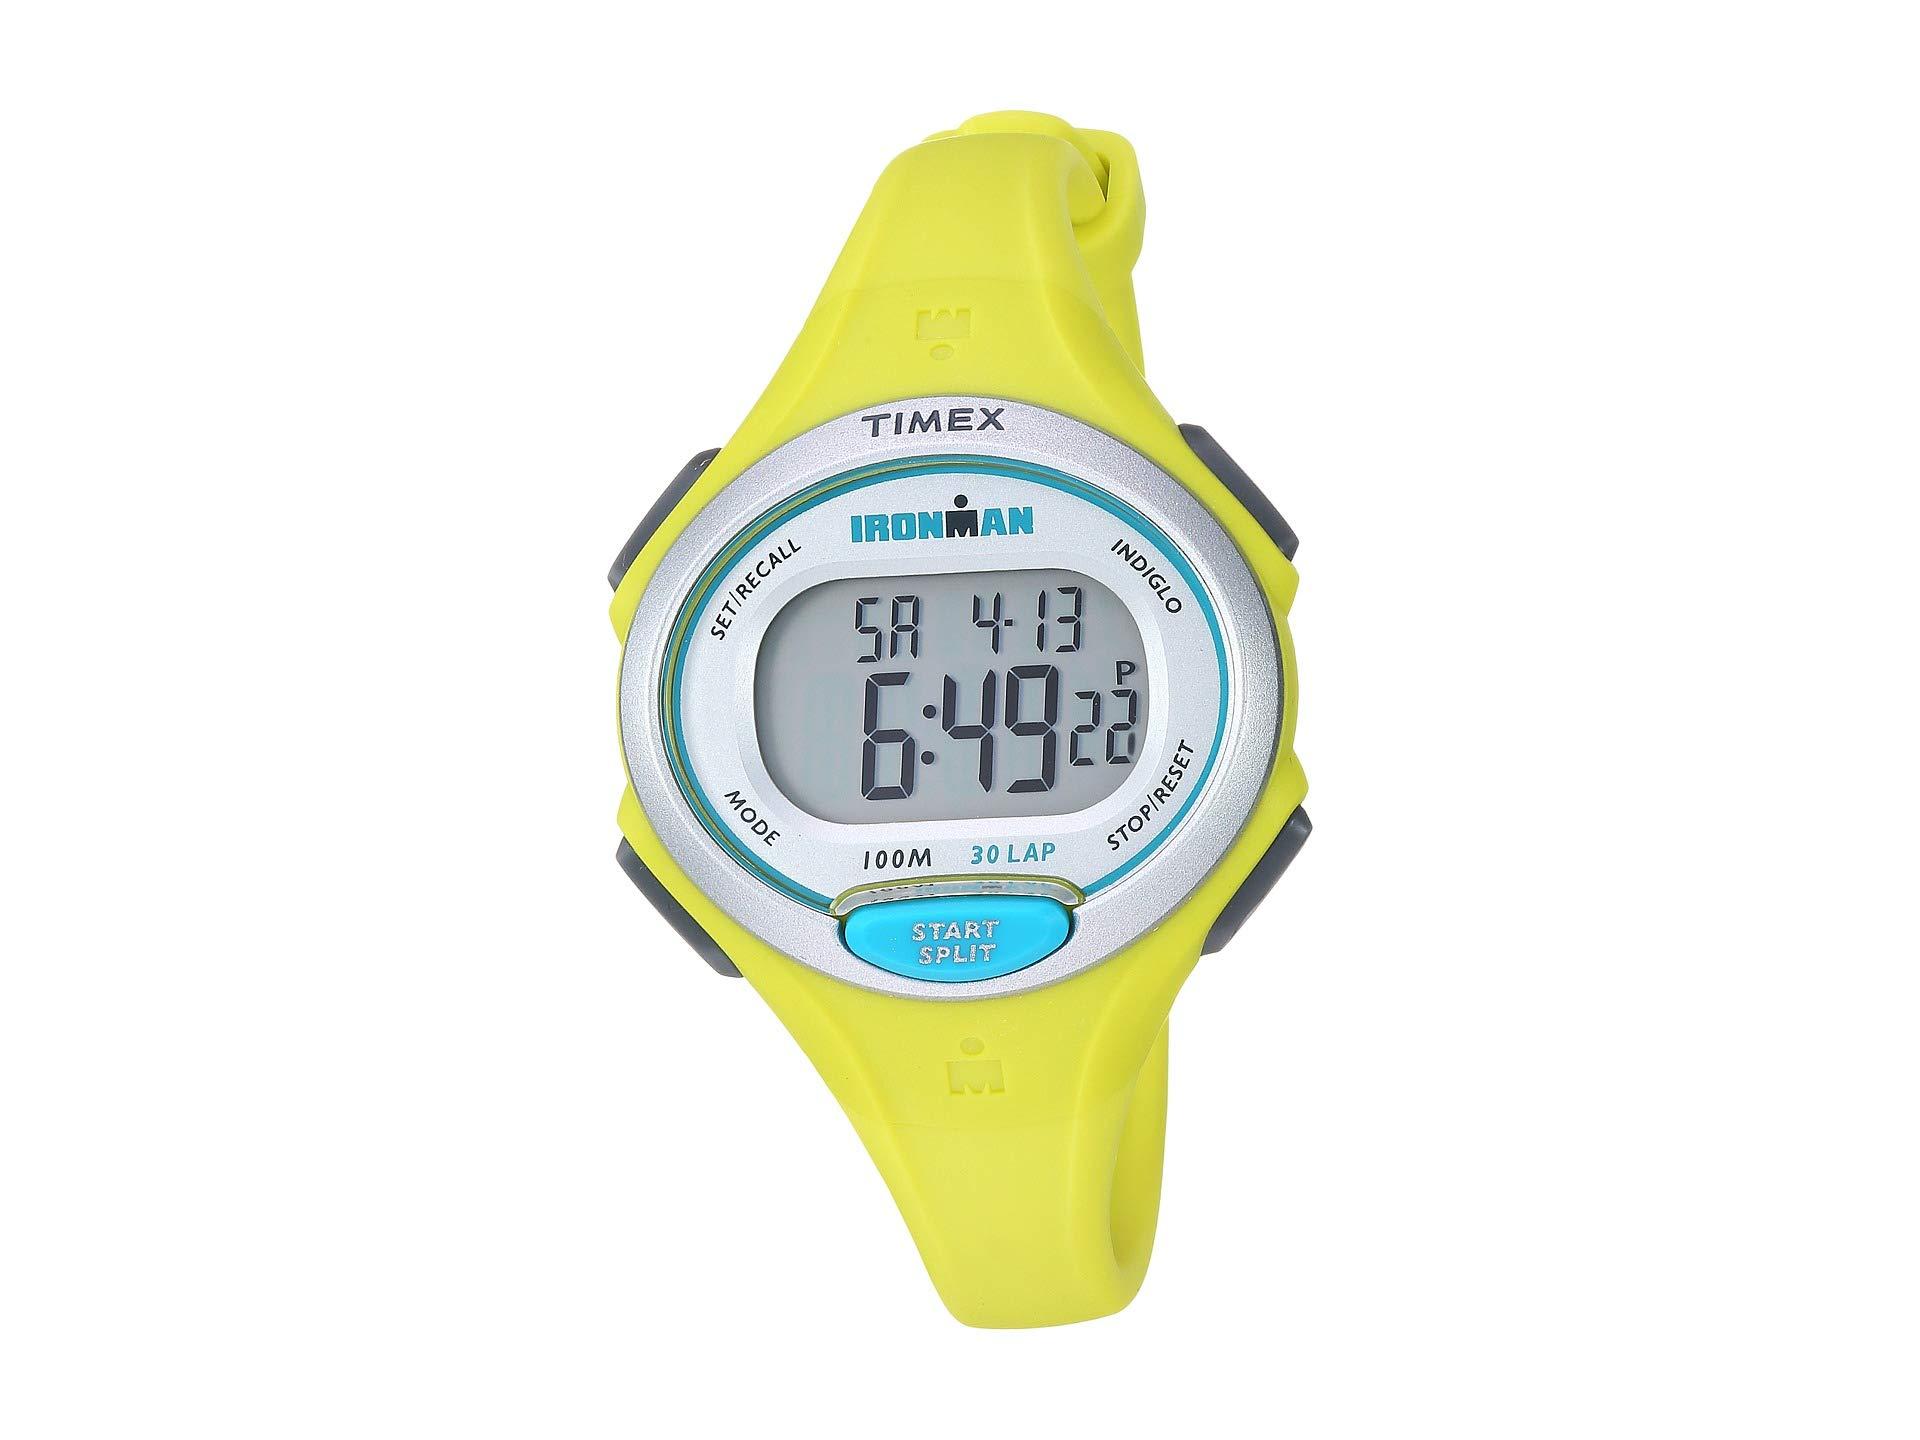 Reloj para Mujer Timex Ironman 30-Lap  + Timex en VeoyCompro.net